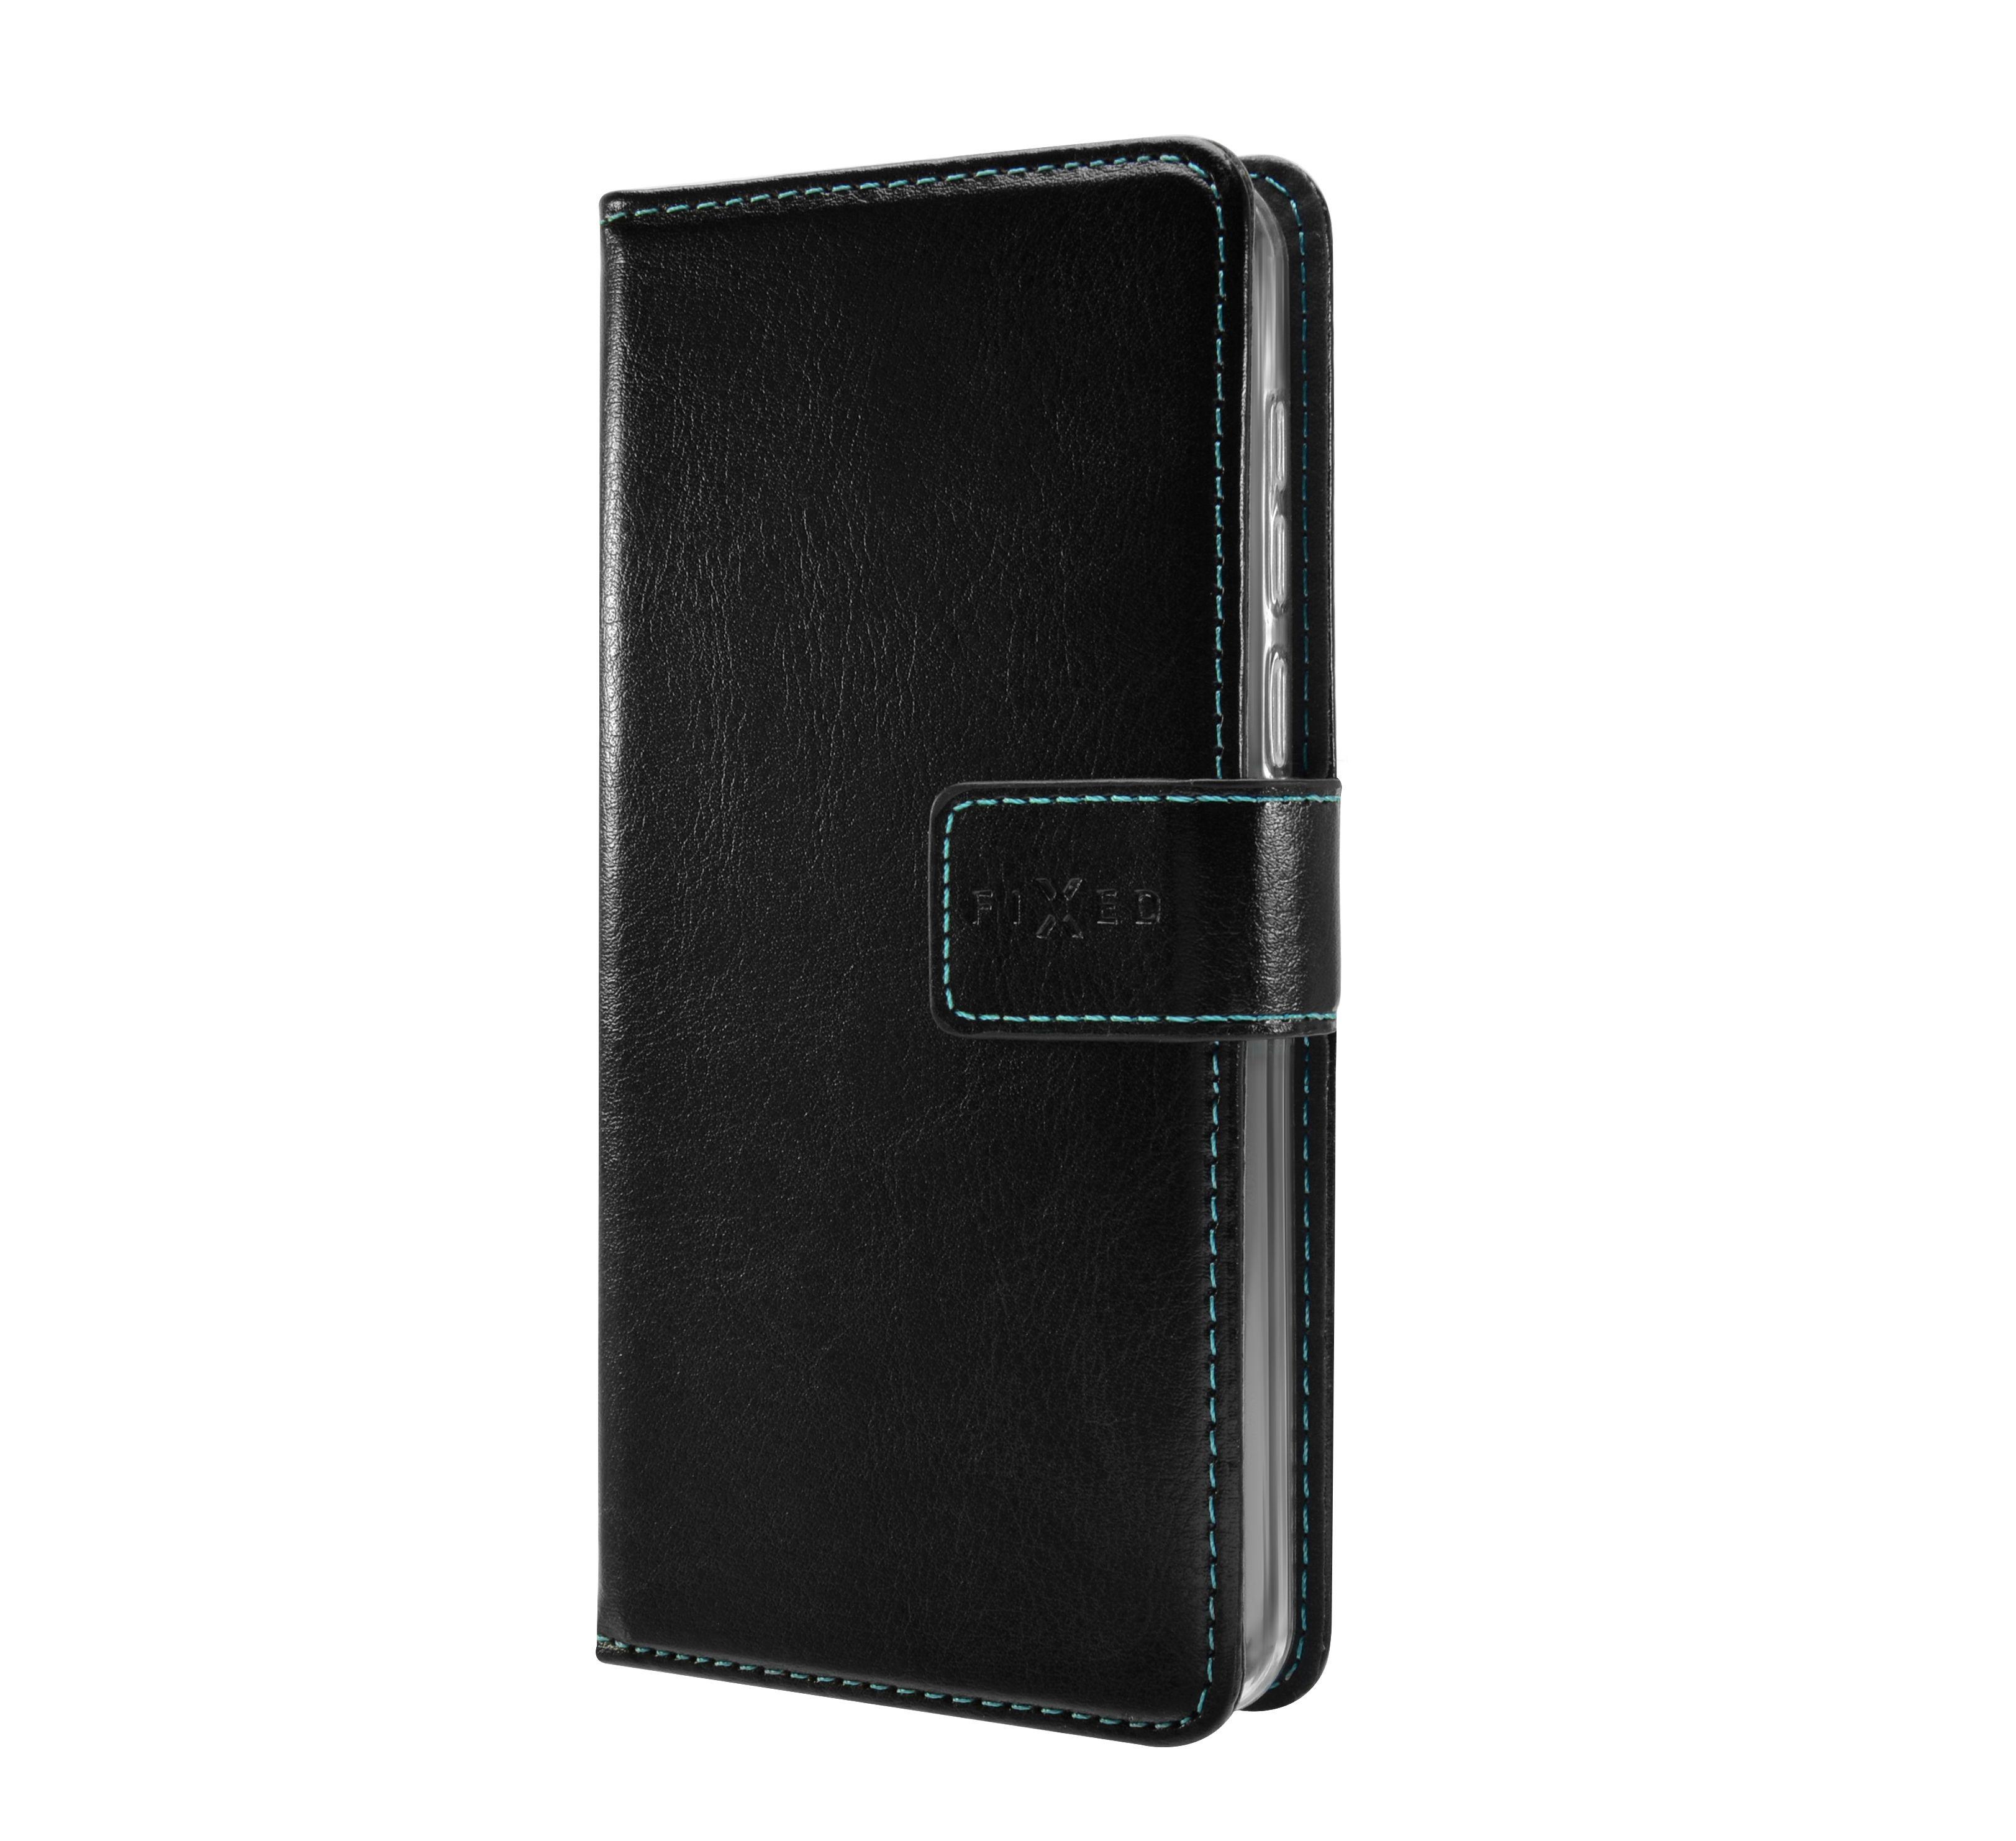 Pouzdro typu kniha FIXED Opus pro Huawei Y6 (2018), black